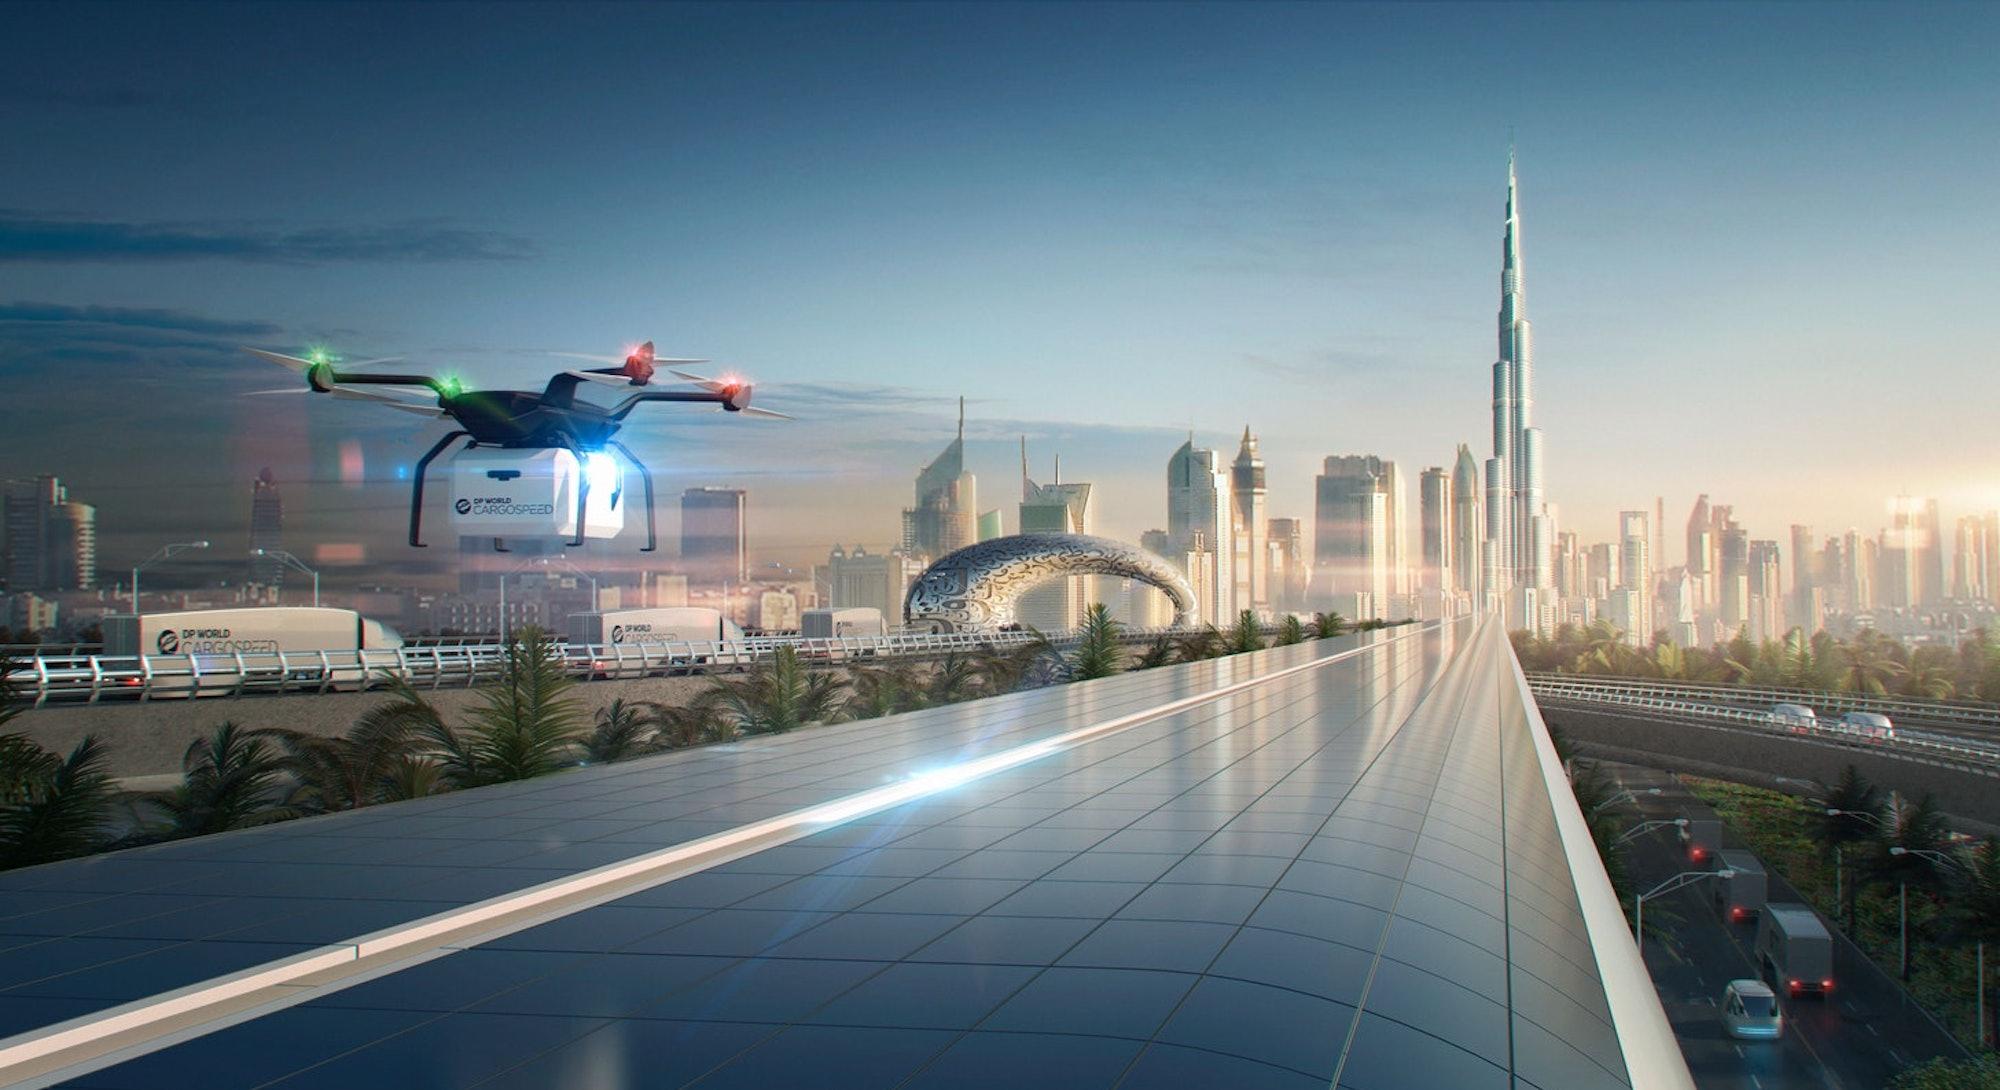 Hyperloop mock-up